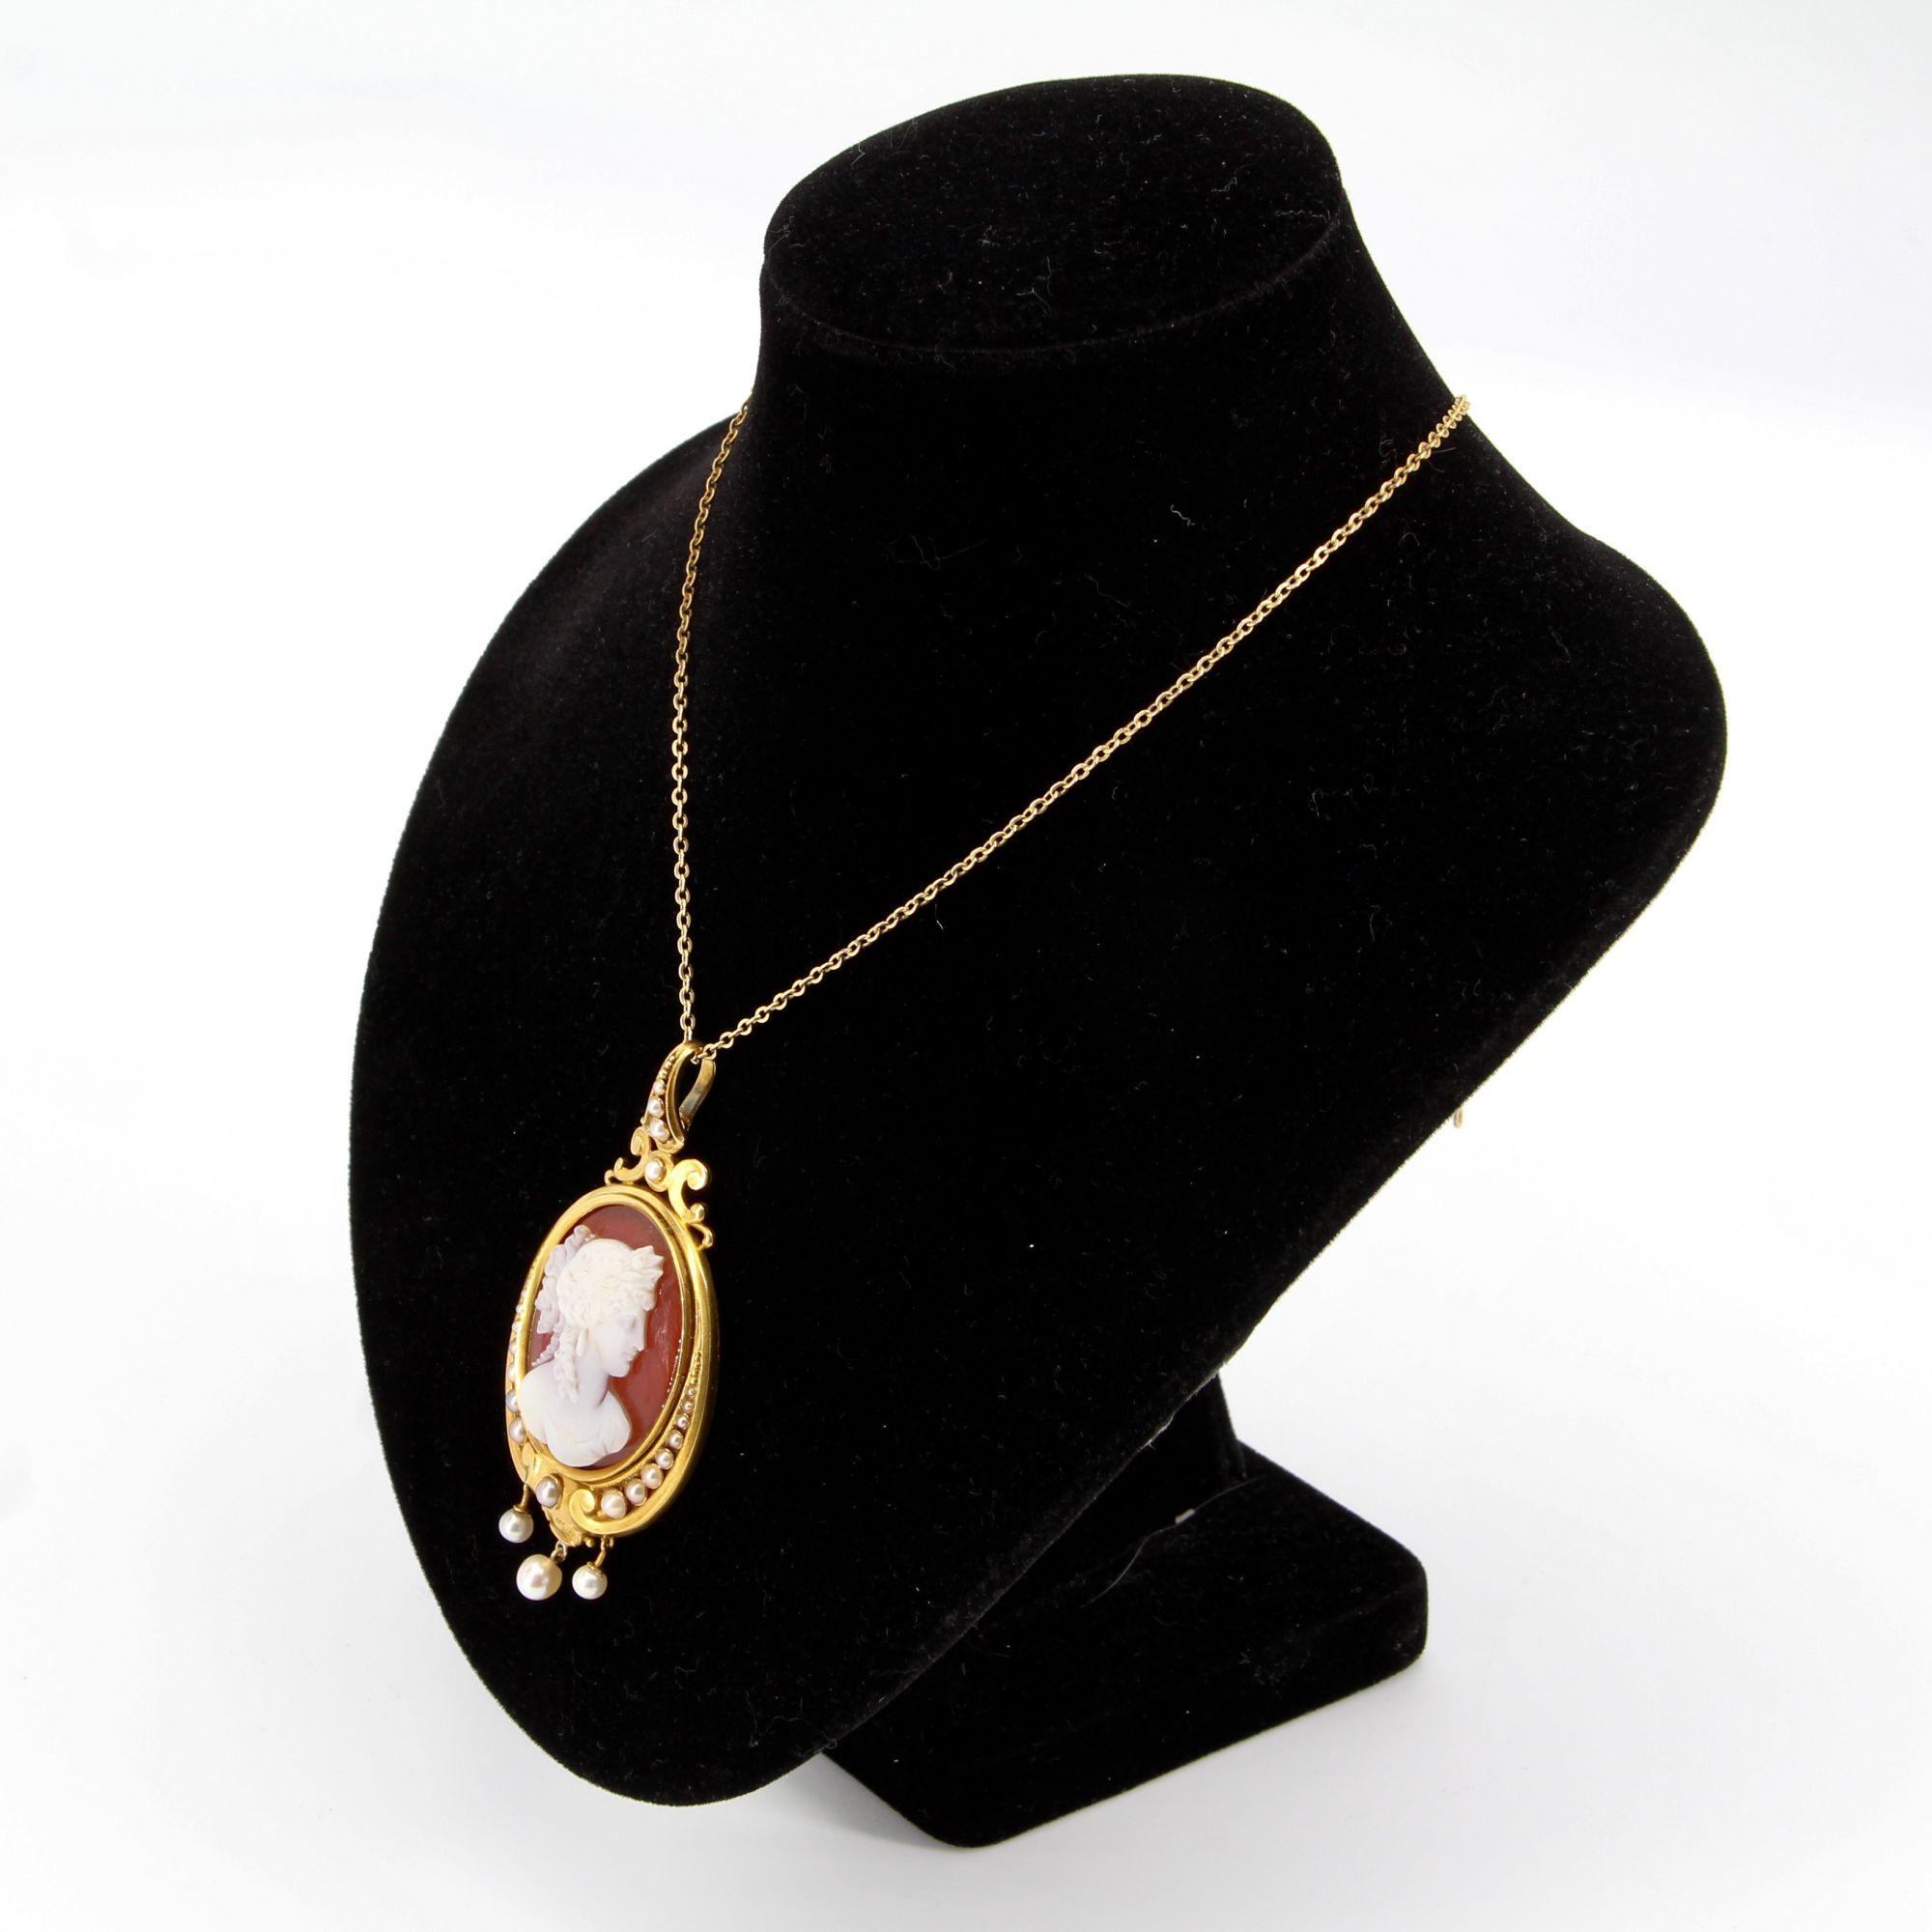 Pendentif ancien Camée et Perles fines